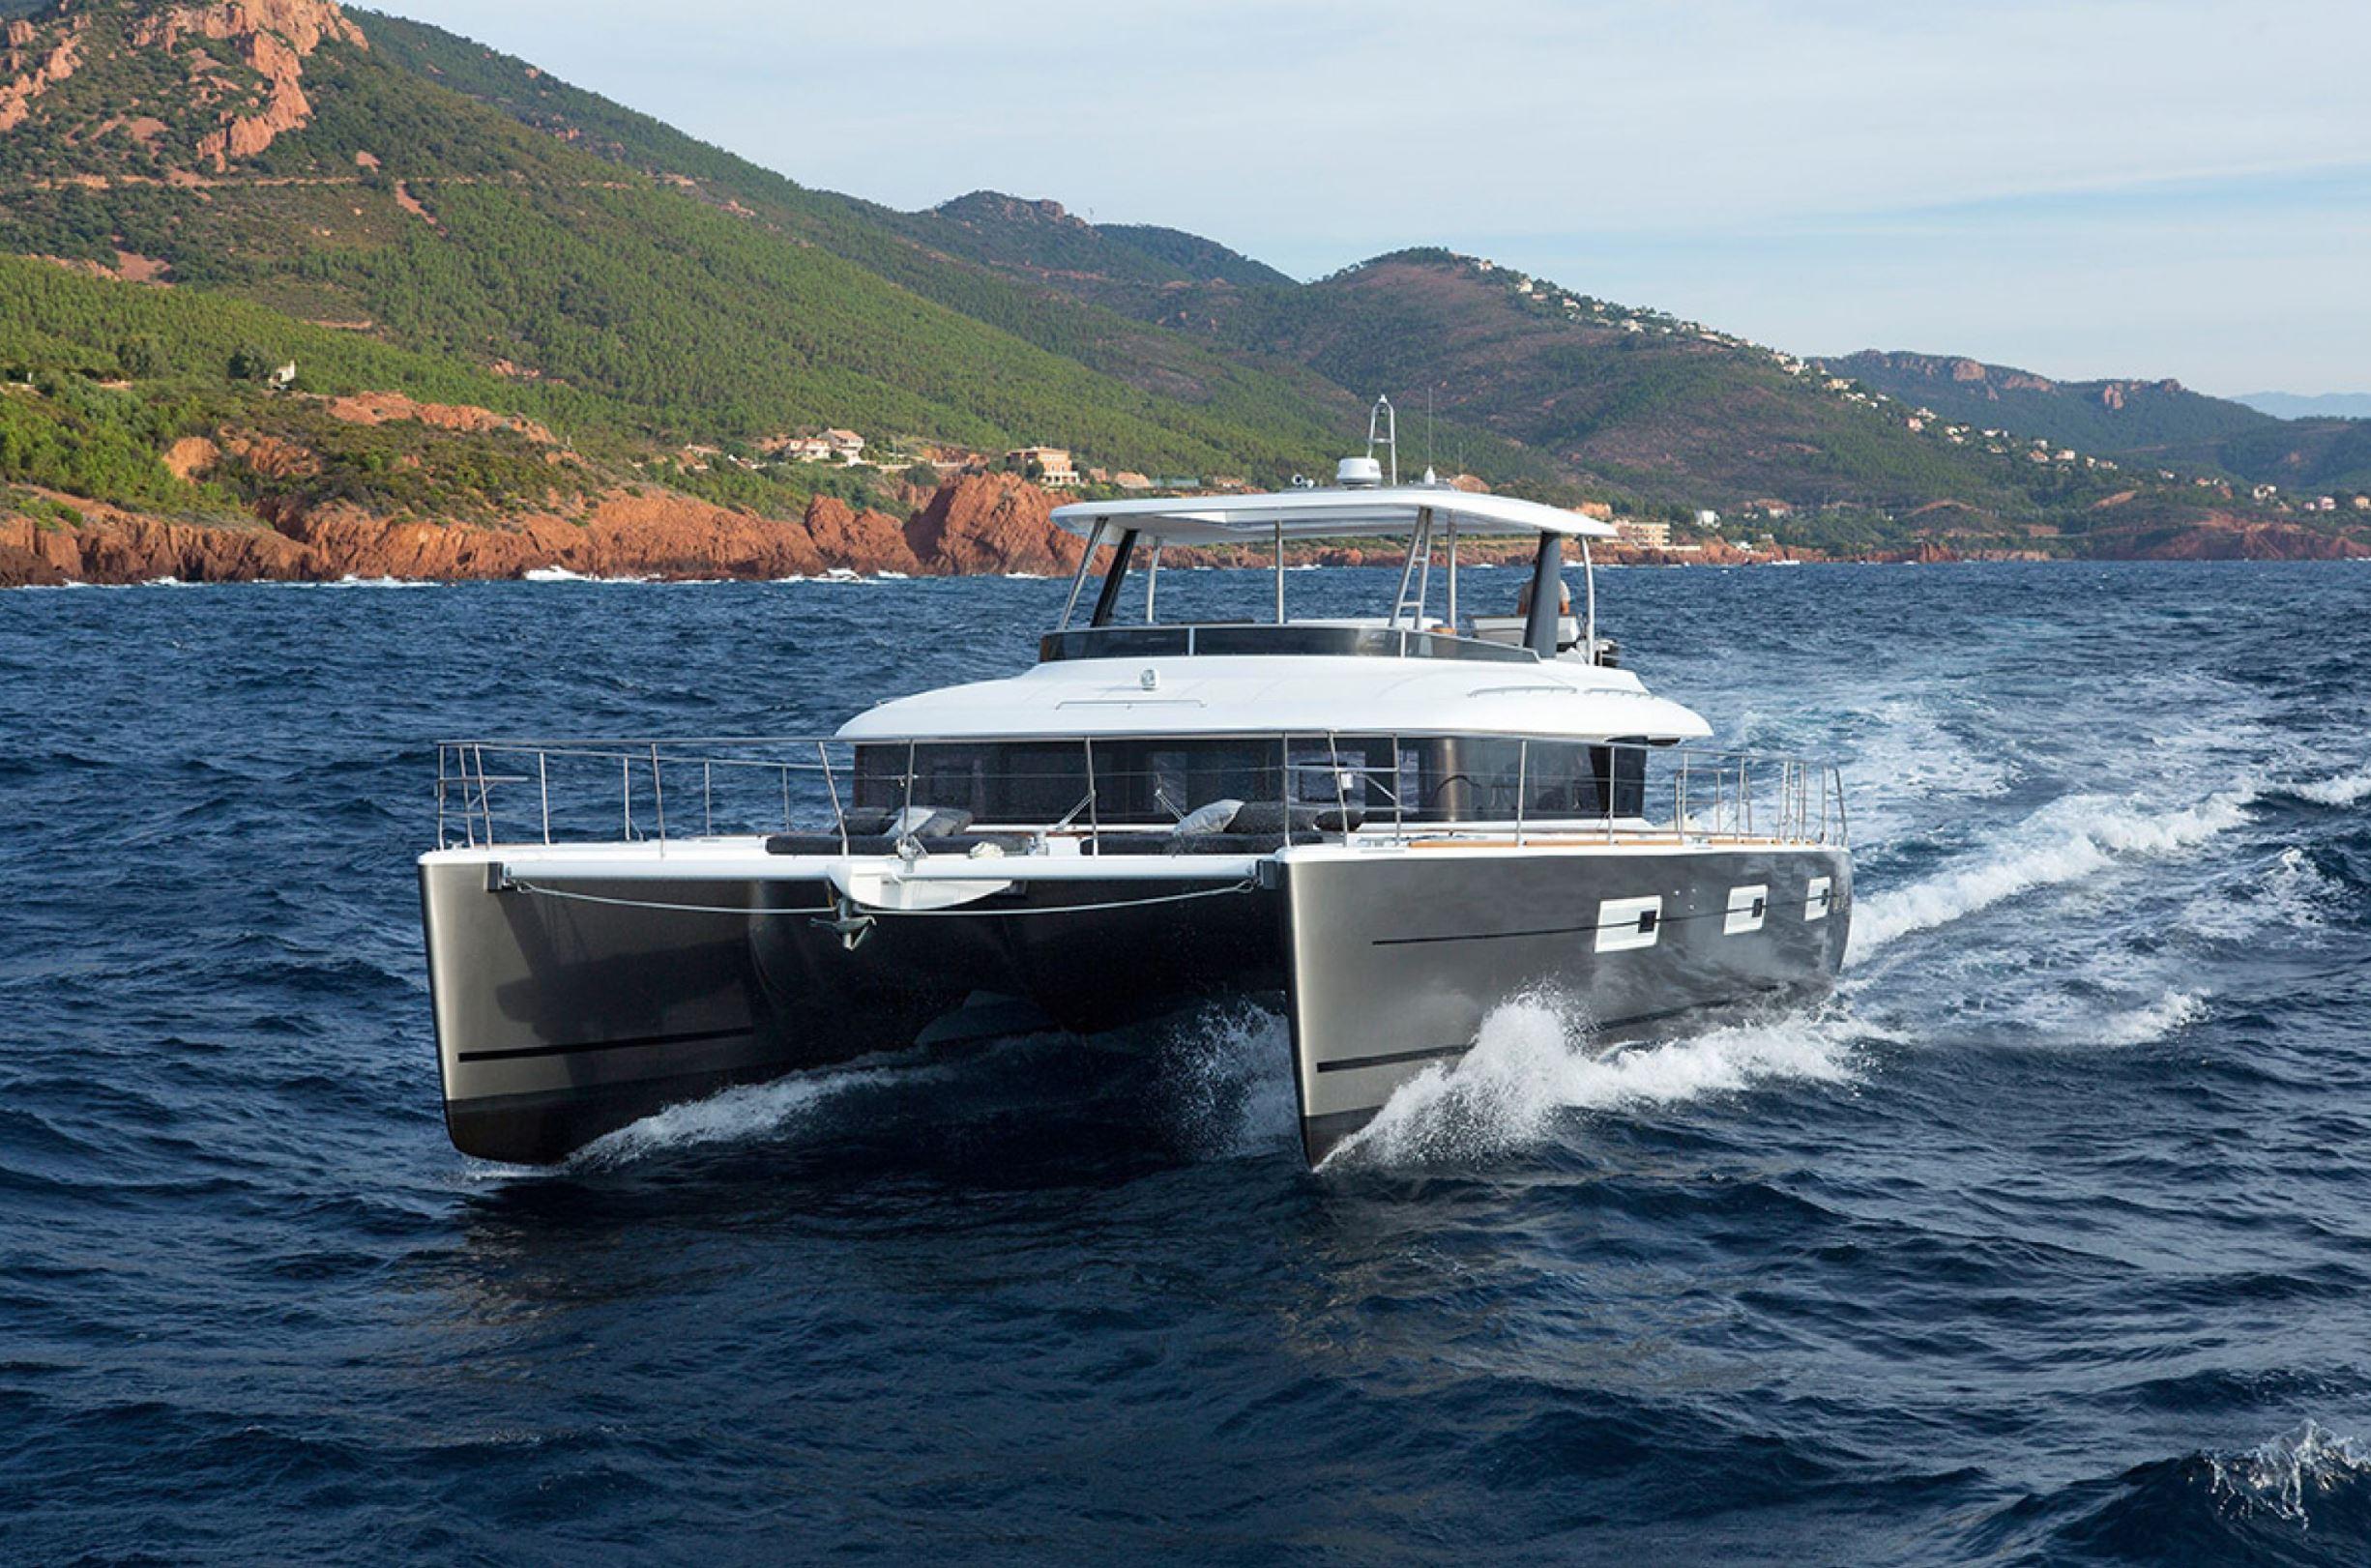 Lagoon Power Catamaran Yacht - Sistership To Long Monday